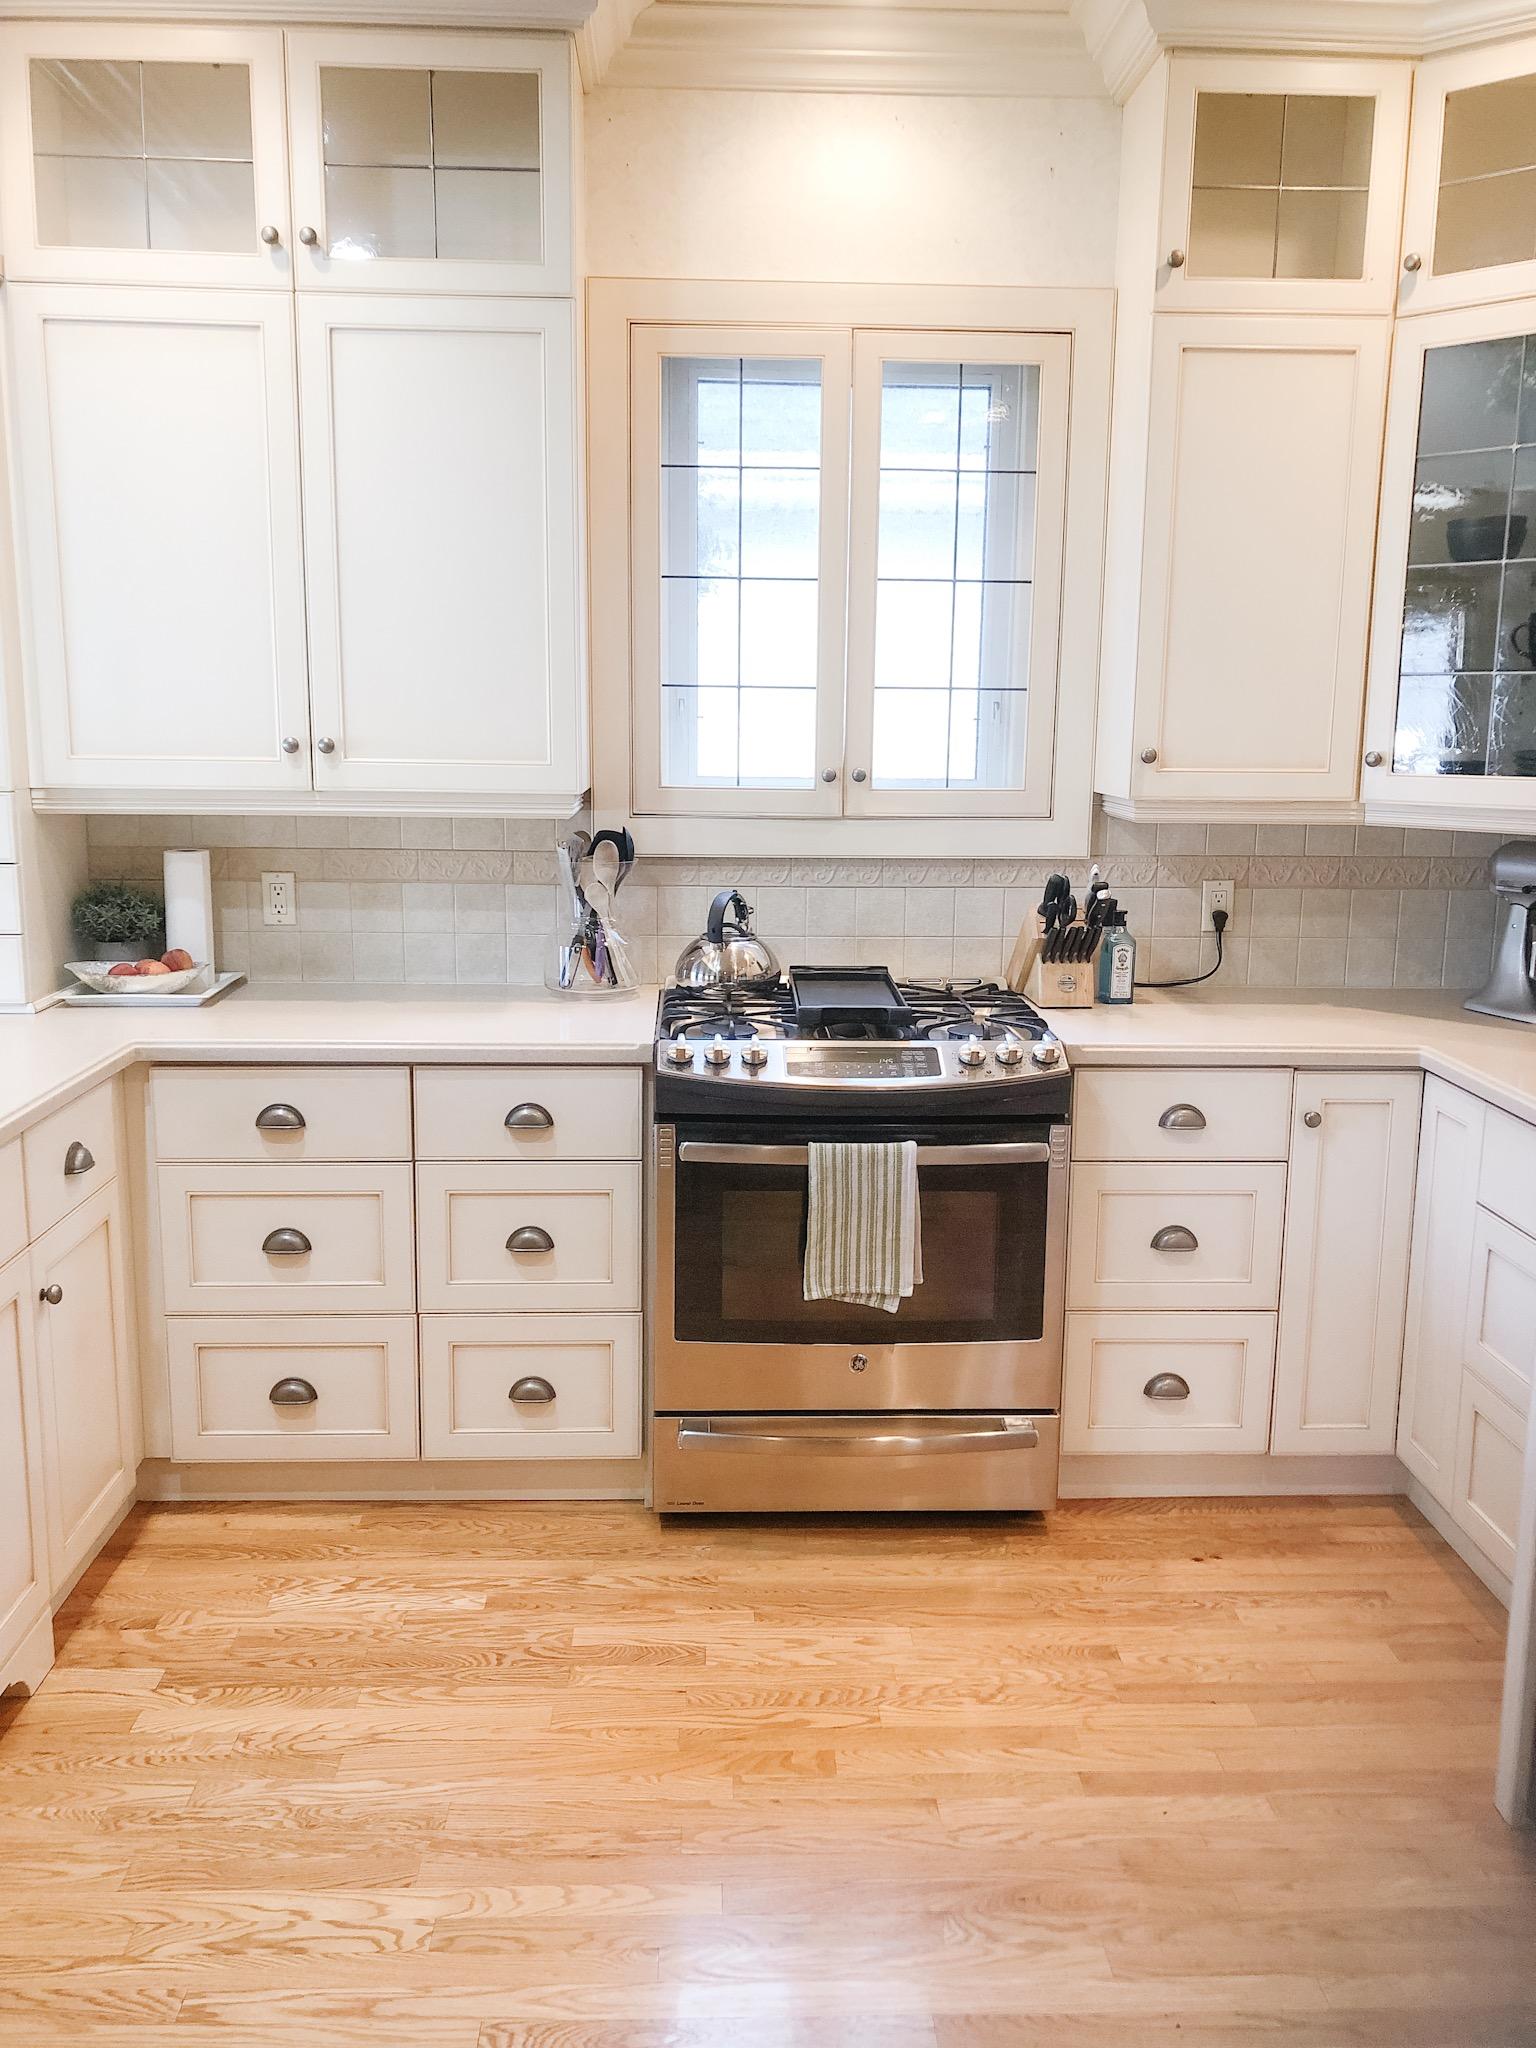 Custom off-white kitchen by interior designer based in Windsor